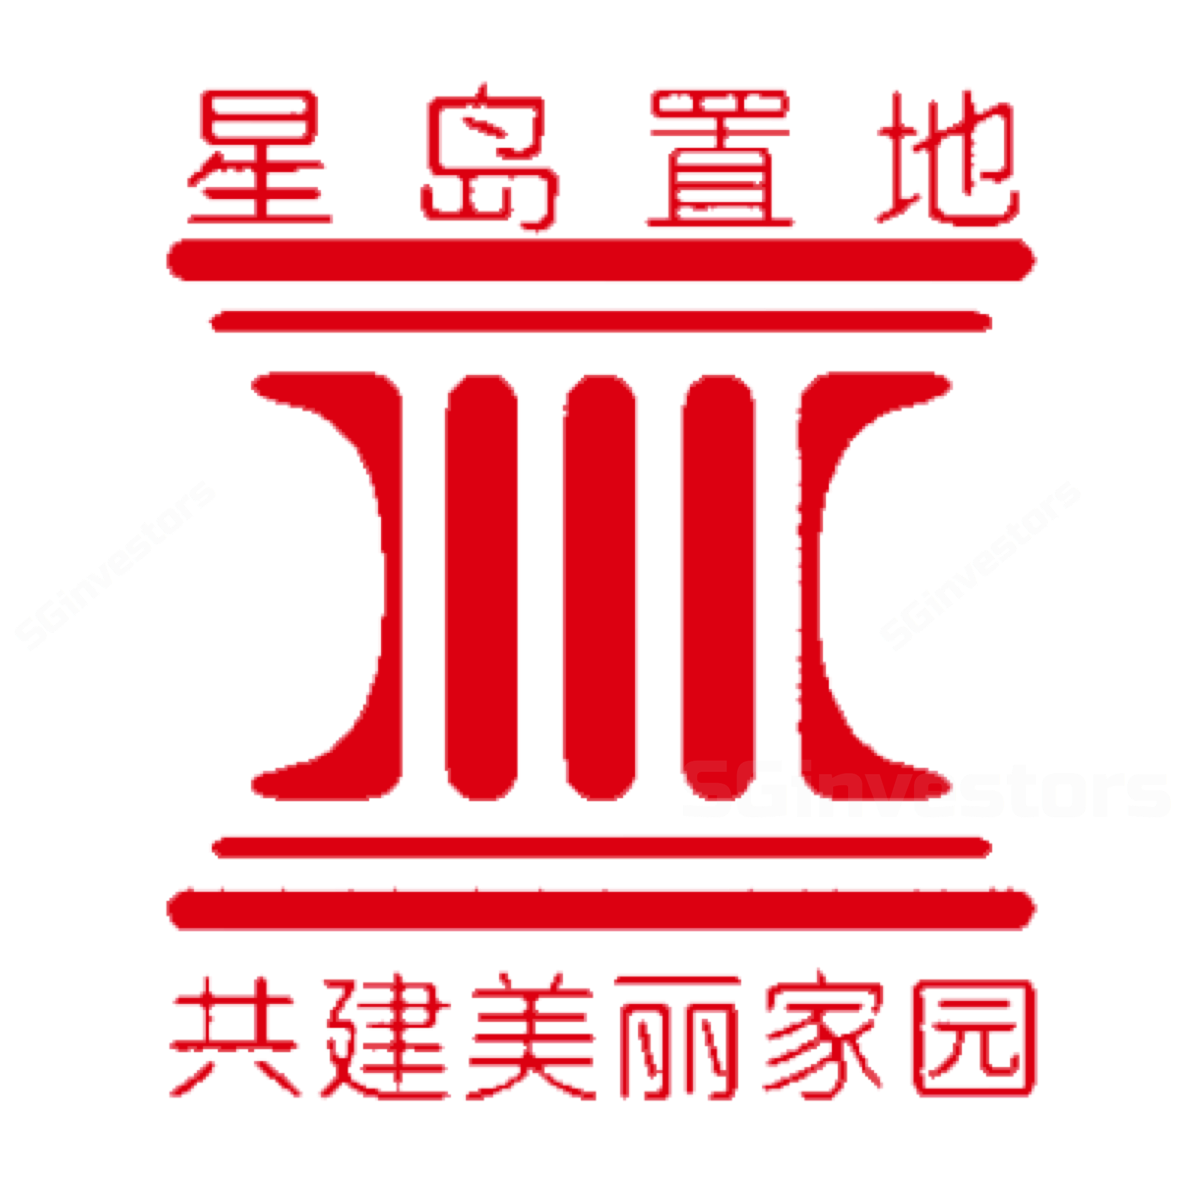 LUMINOR FINANCIAL HOLDINGS LTD (SGX:5UA) @ SGinvestors.io